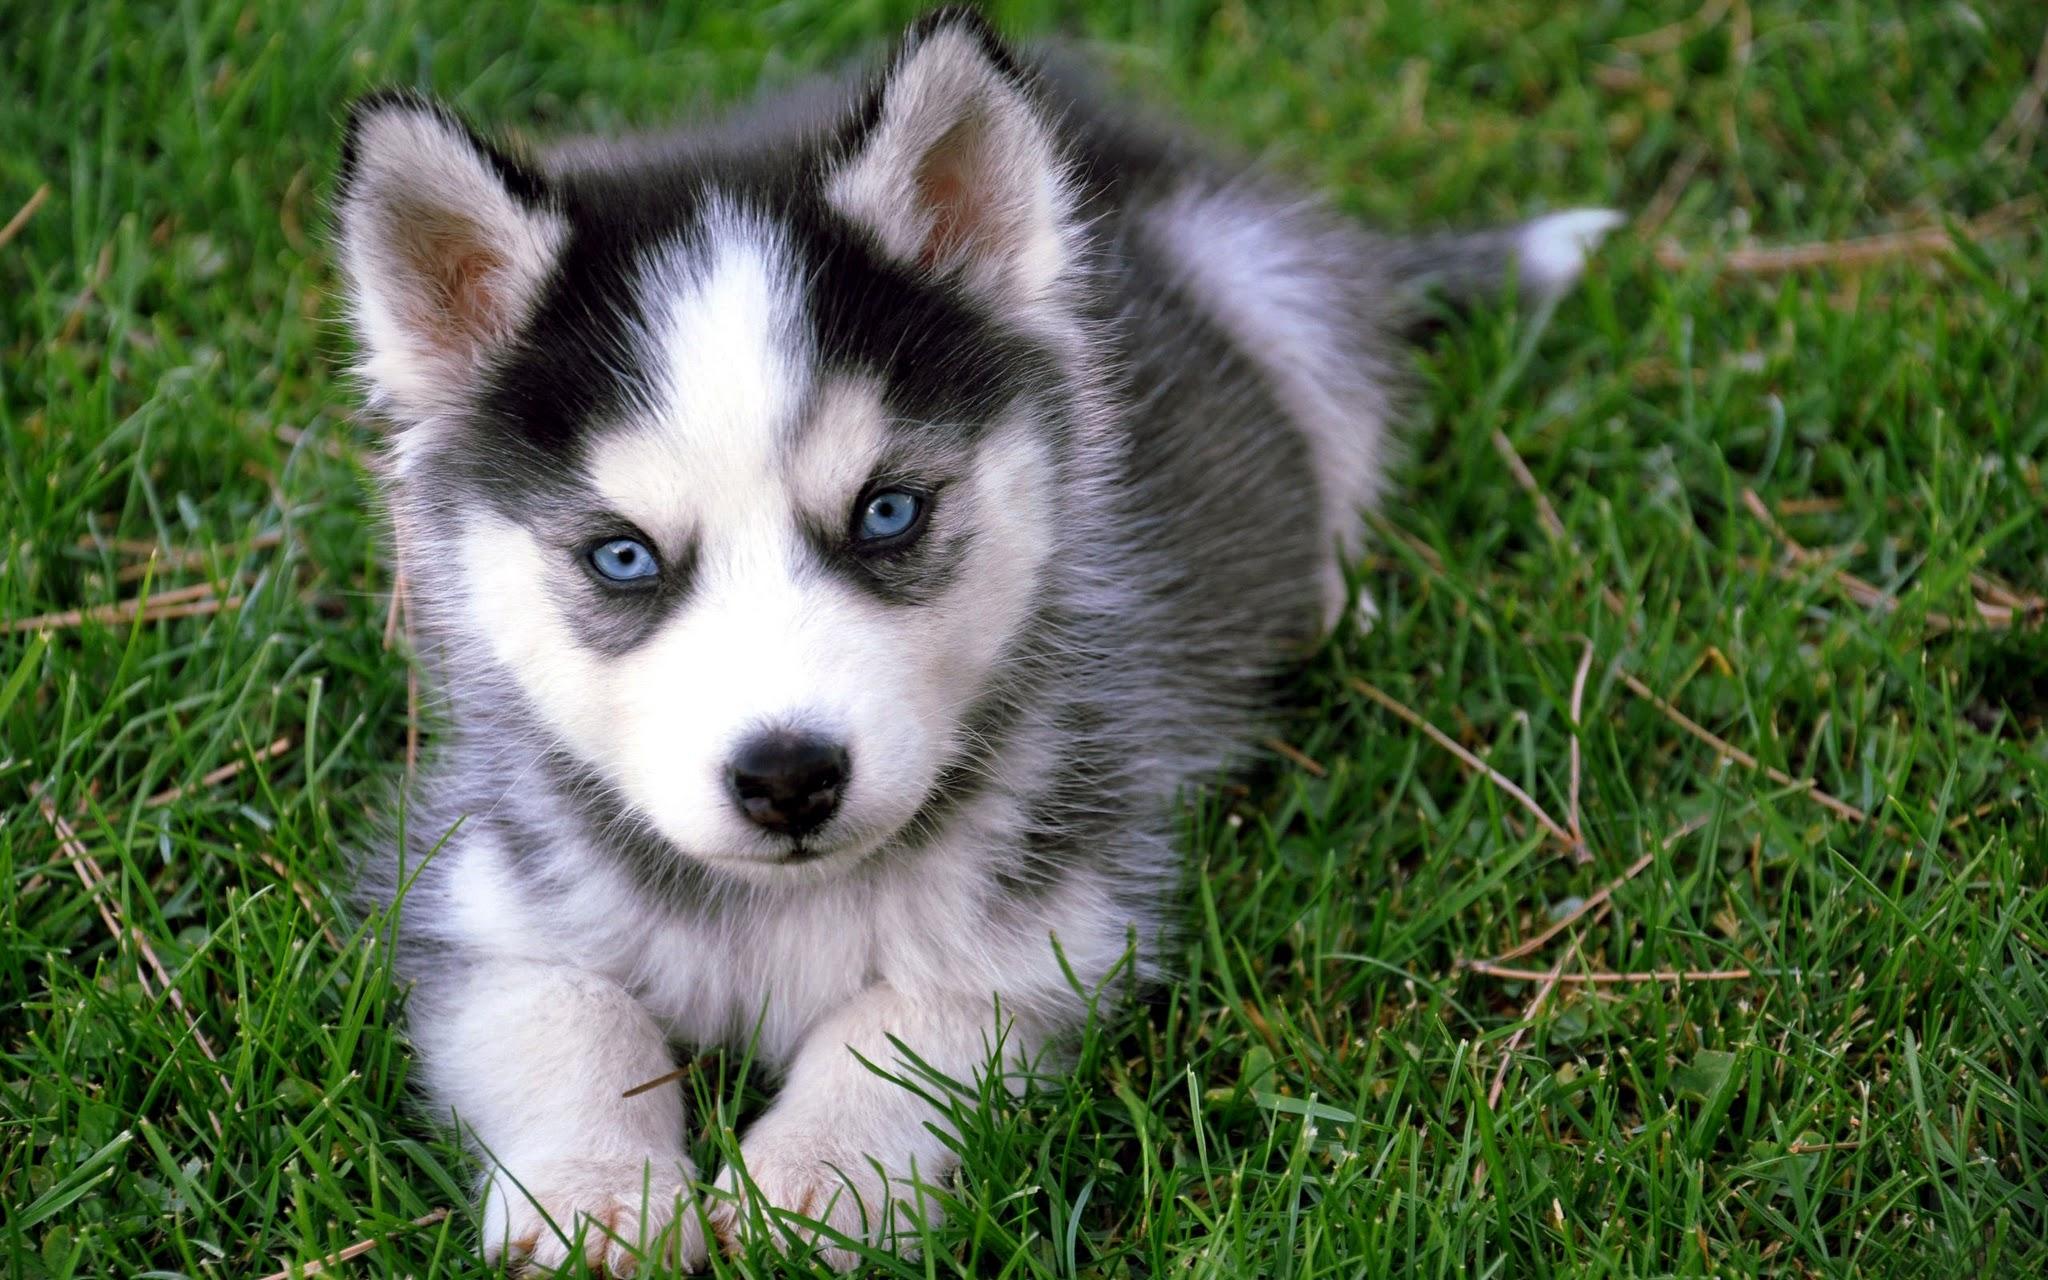 Cute Puppy Dog in Grass Full HD Wallpaper | Hd Wallpaper